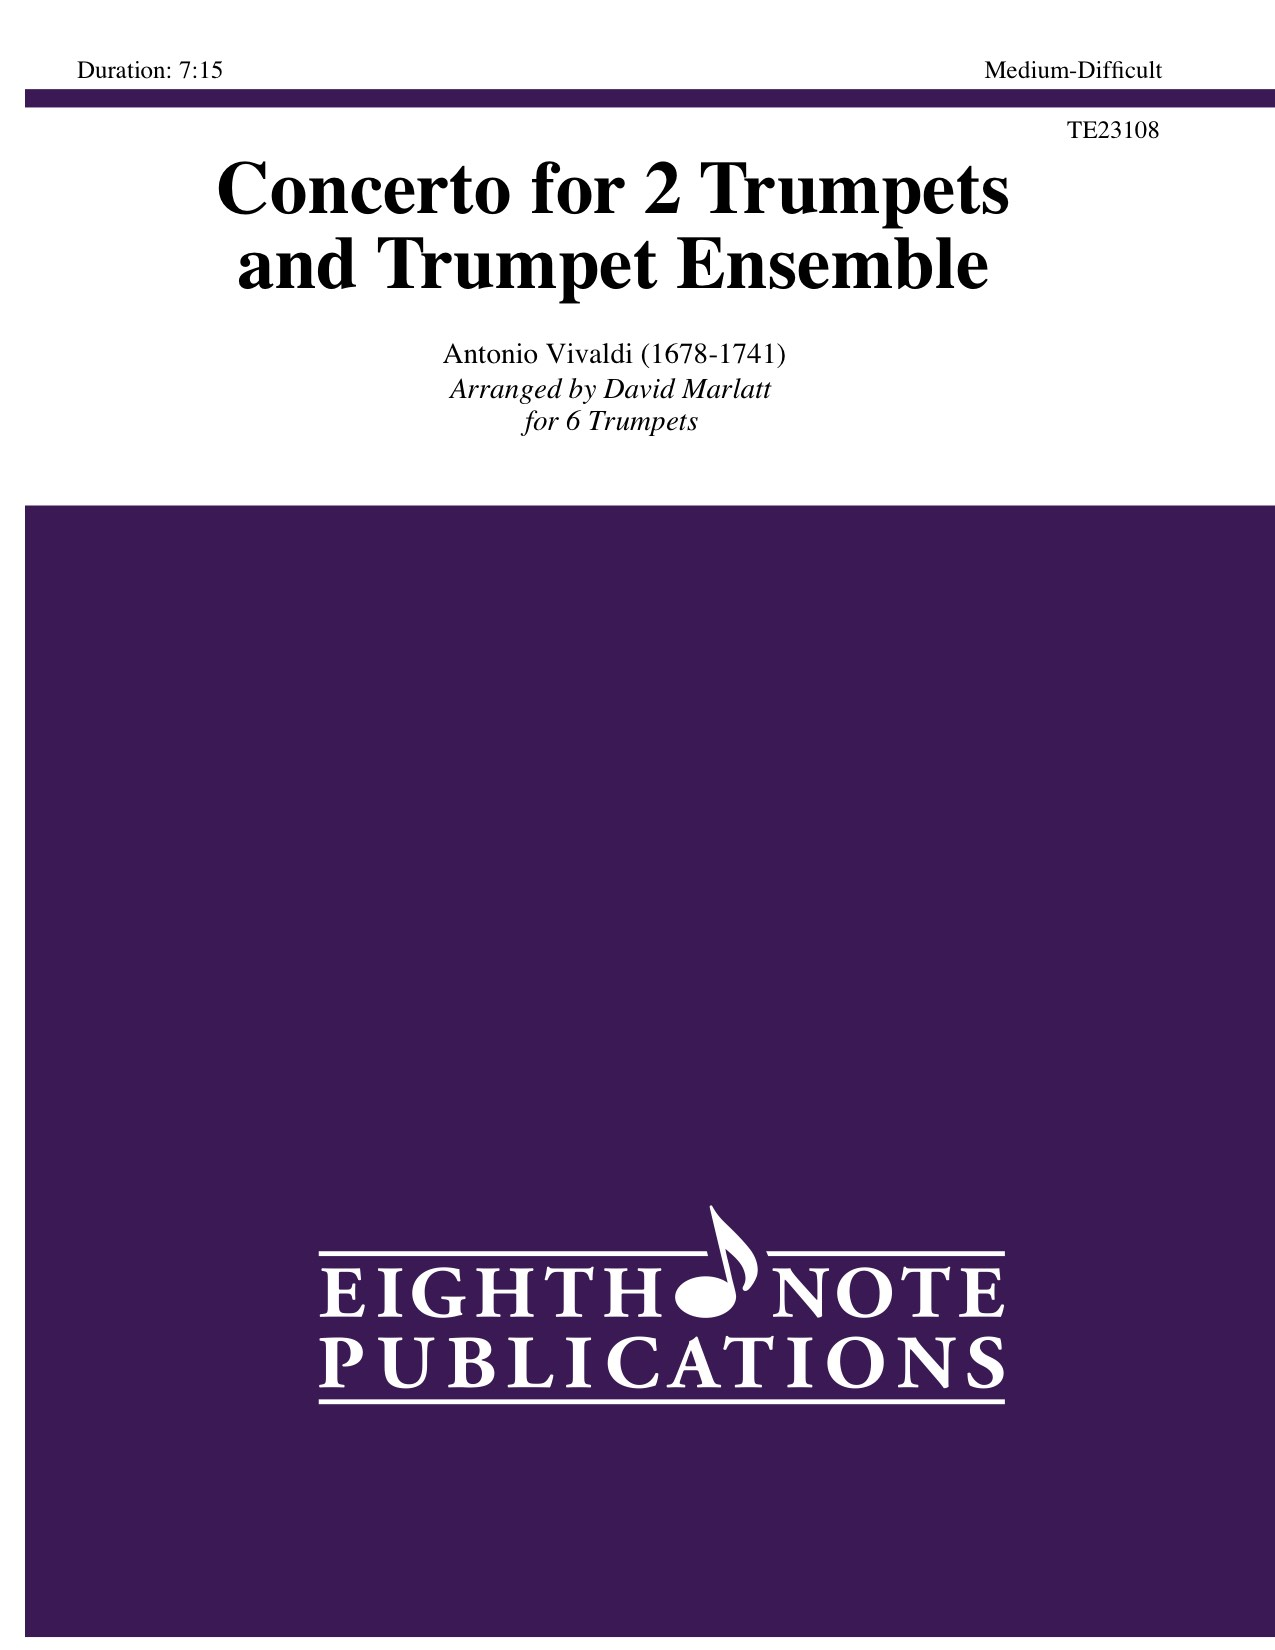 Concerto for 2 Trumpets and Trumpet Ensemble  - Antonio Vivaldi